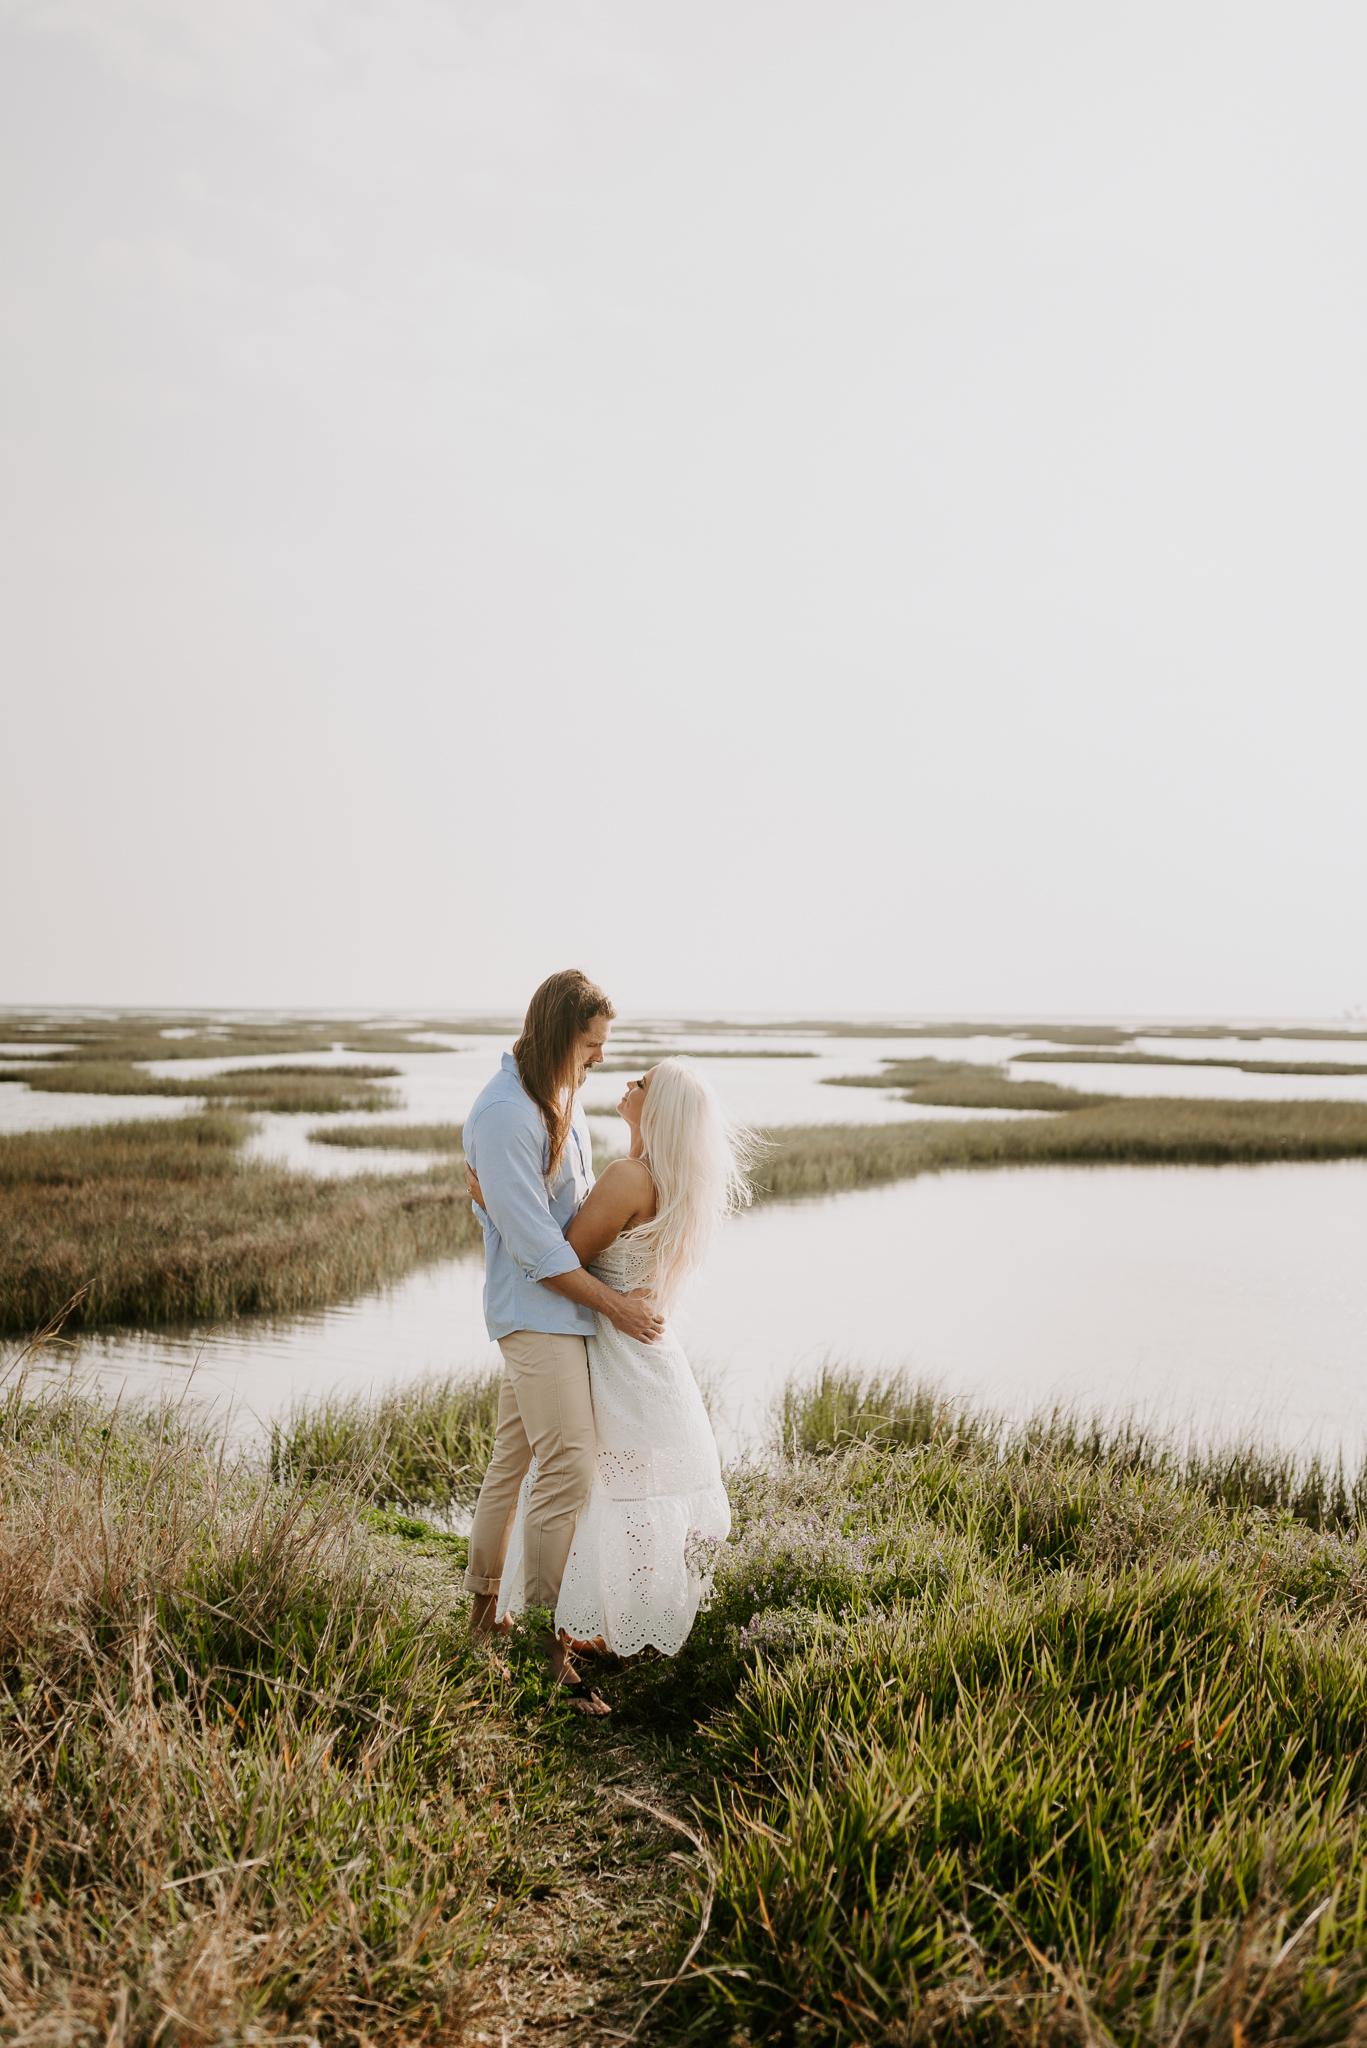 Ashley + Charles - Galveston Texas Moody Engagement Session | Kristen Giles Photography - 006.jpg